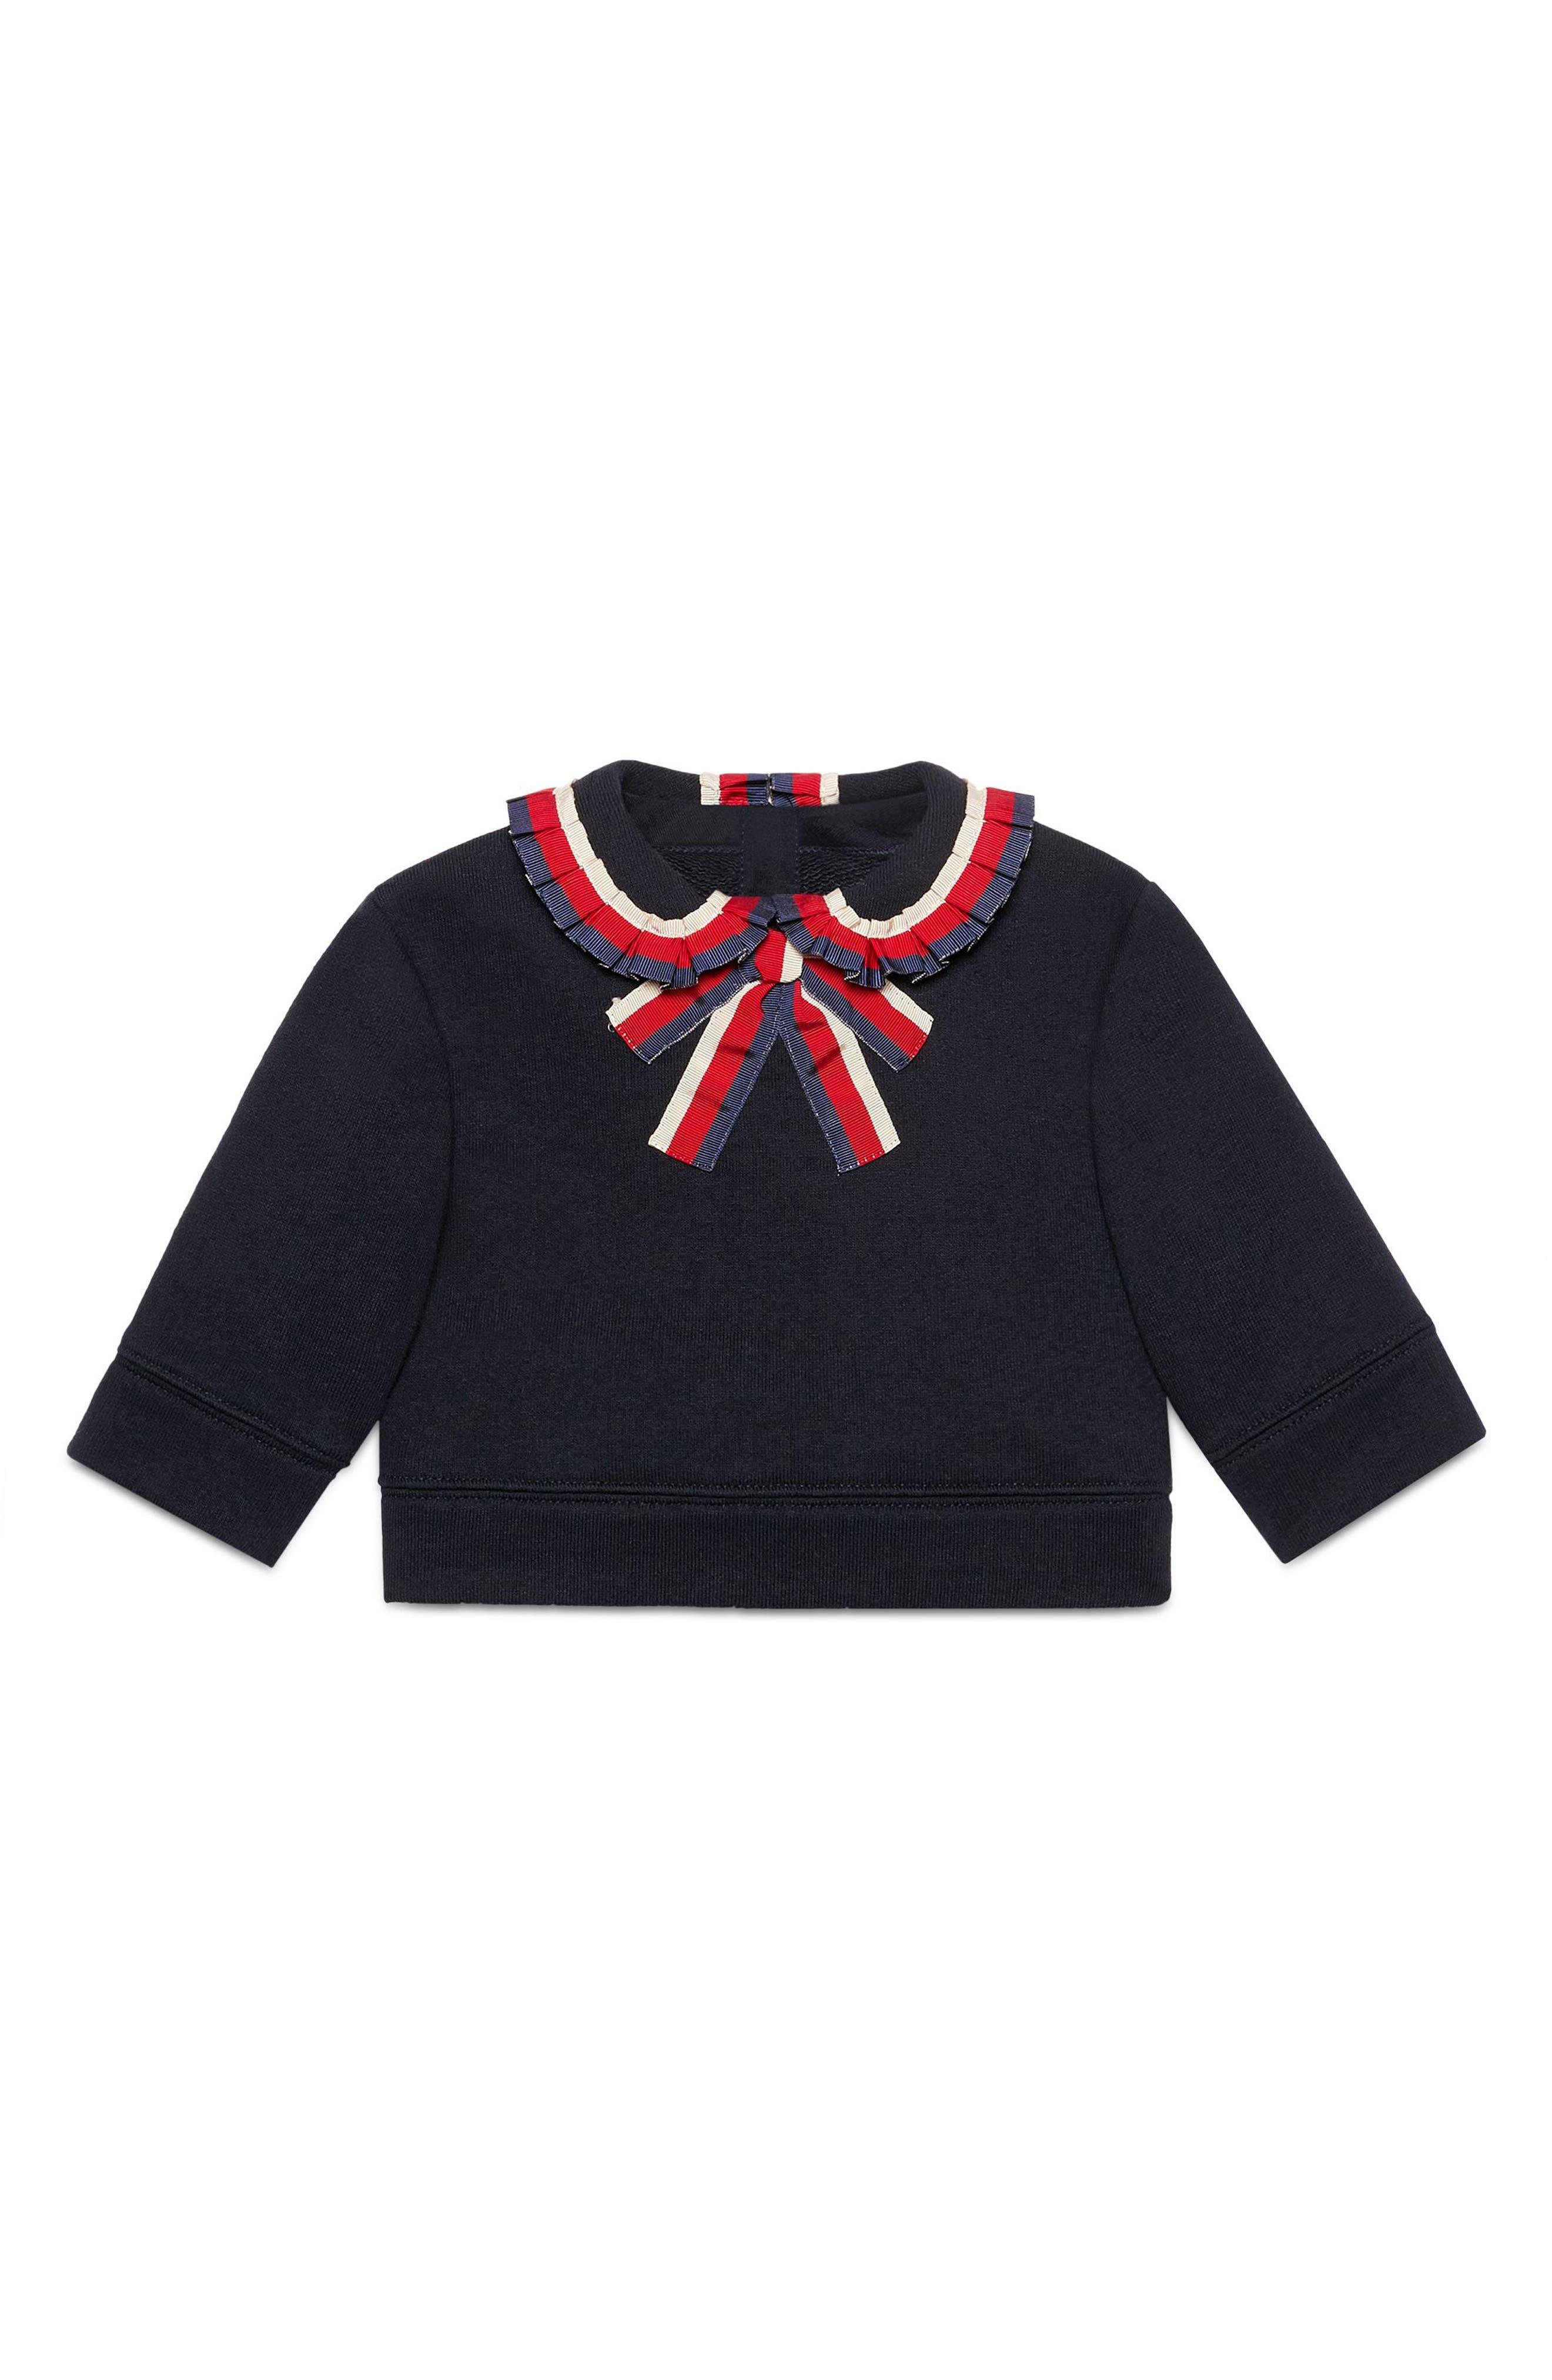 Gucci Sylvie Ribbon Trim Sweatshirt (Baby Girls)